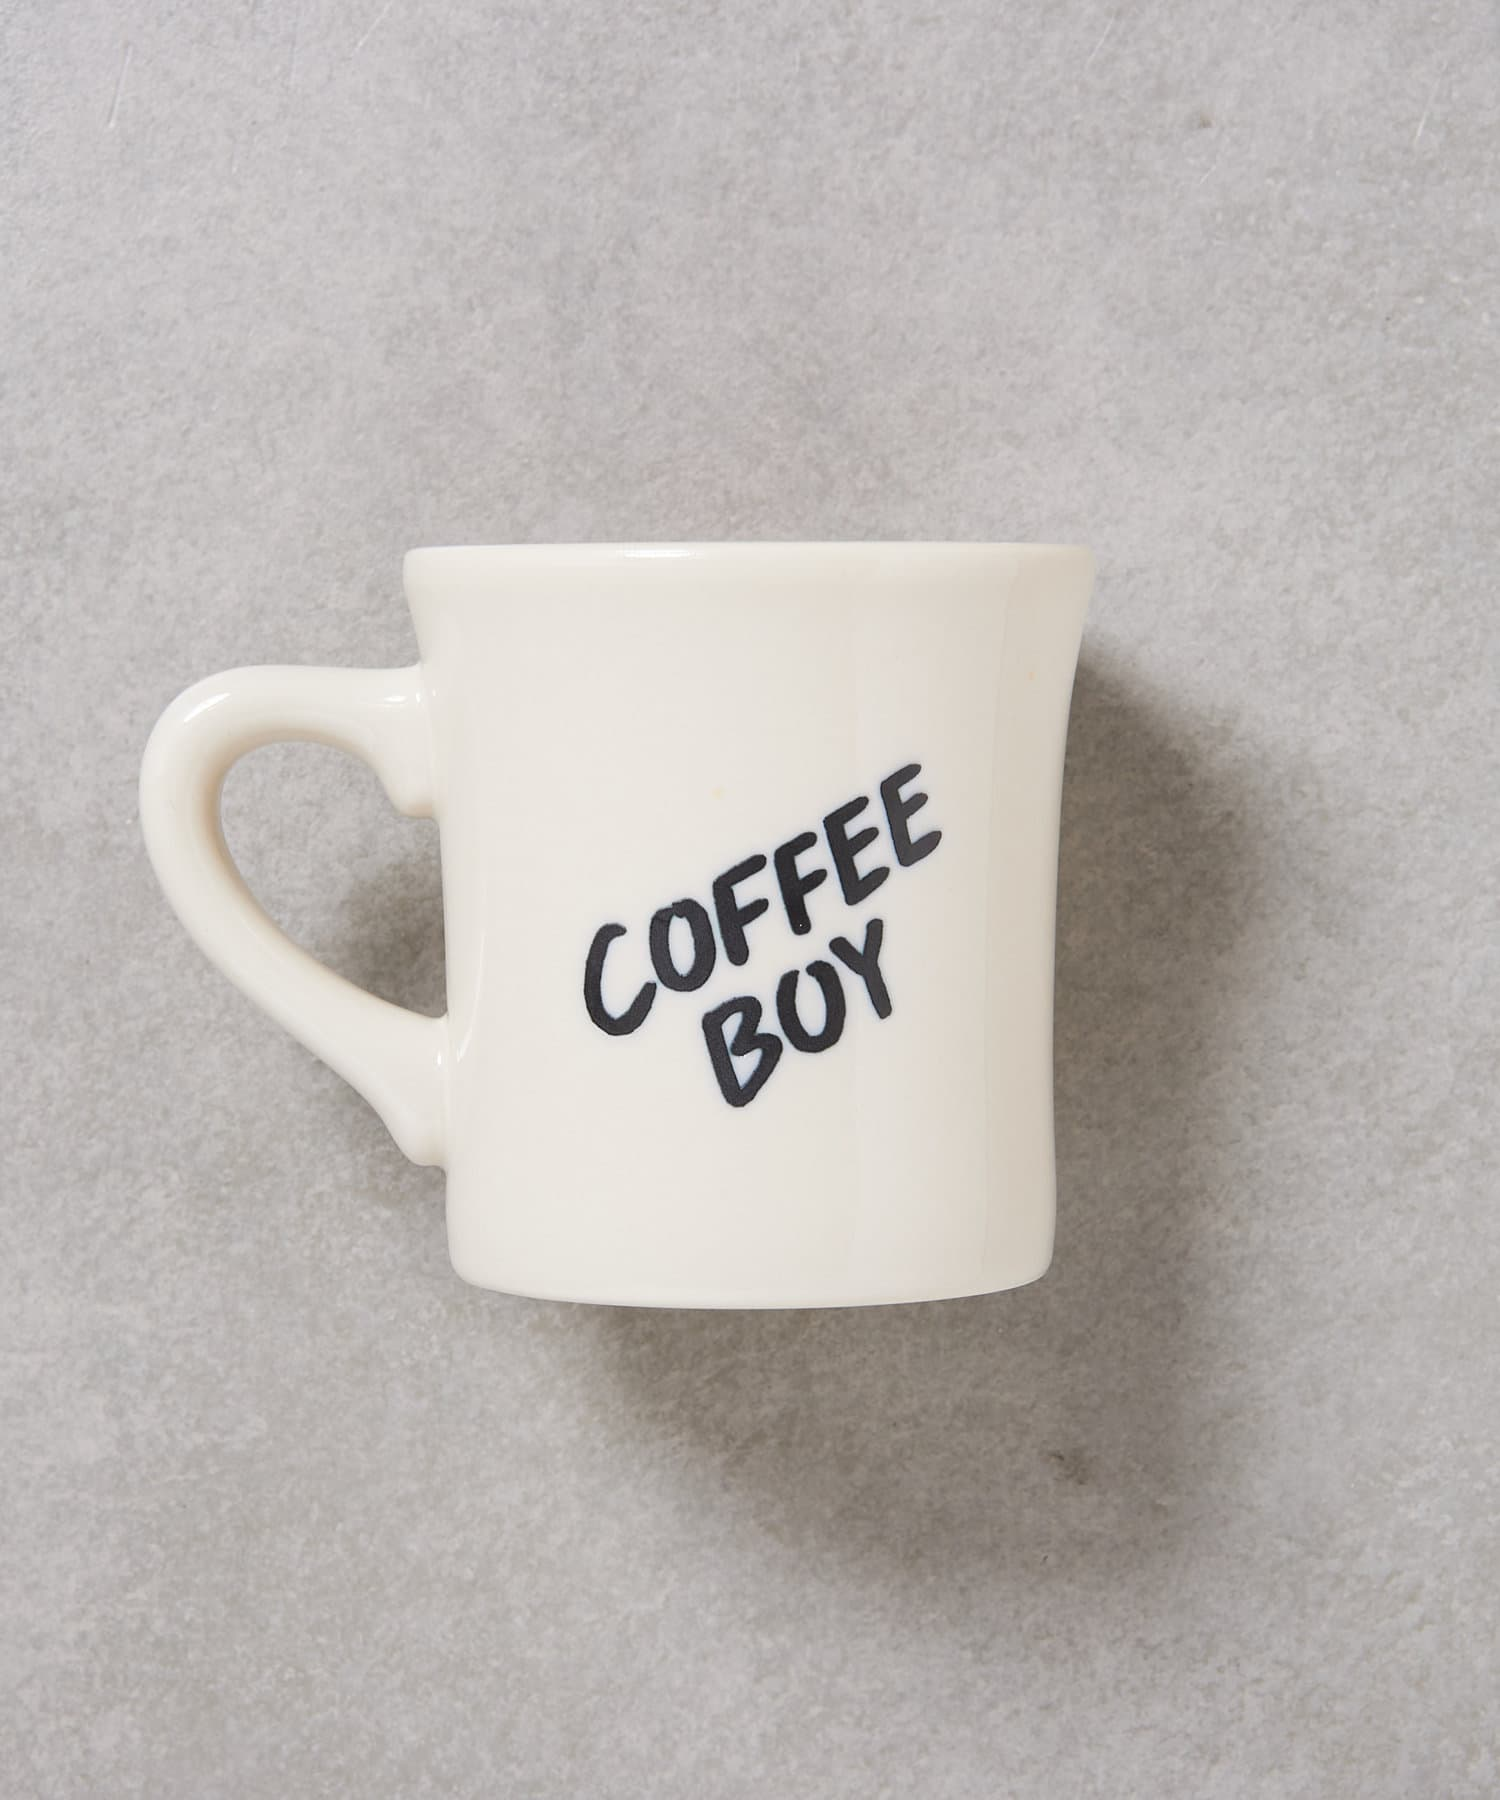 BIRTHDAY BAR(バースデイバー) COFFEE BOY ペアマグカップ